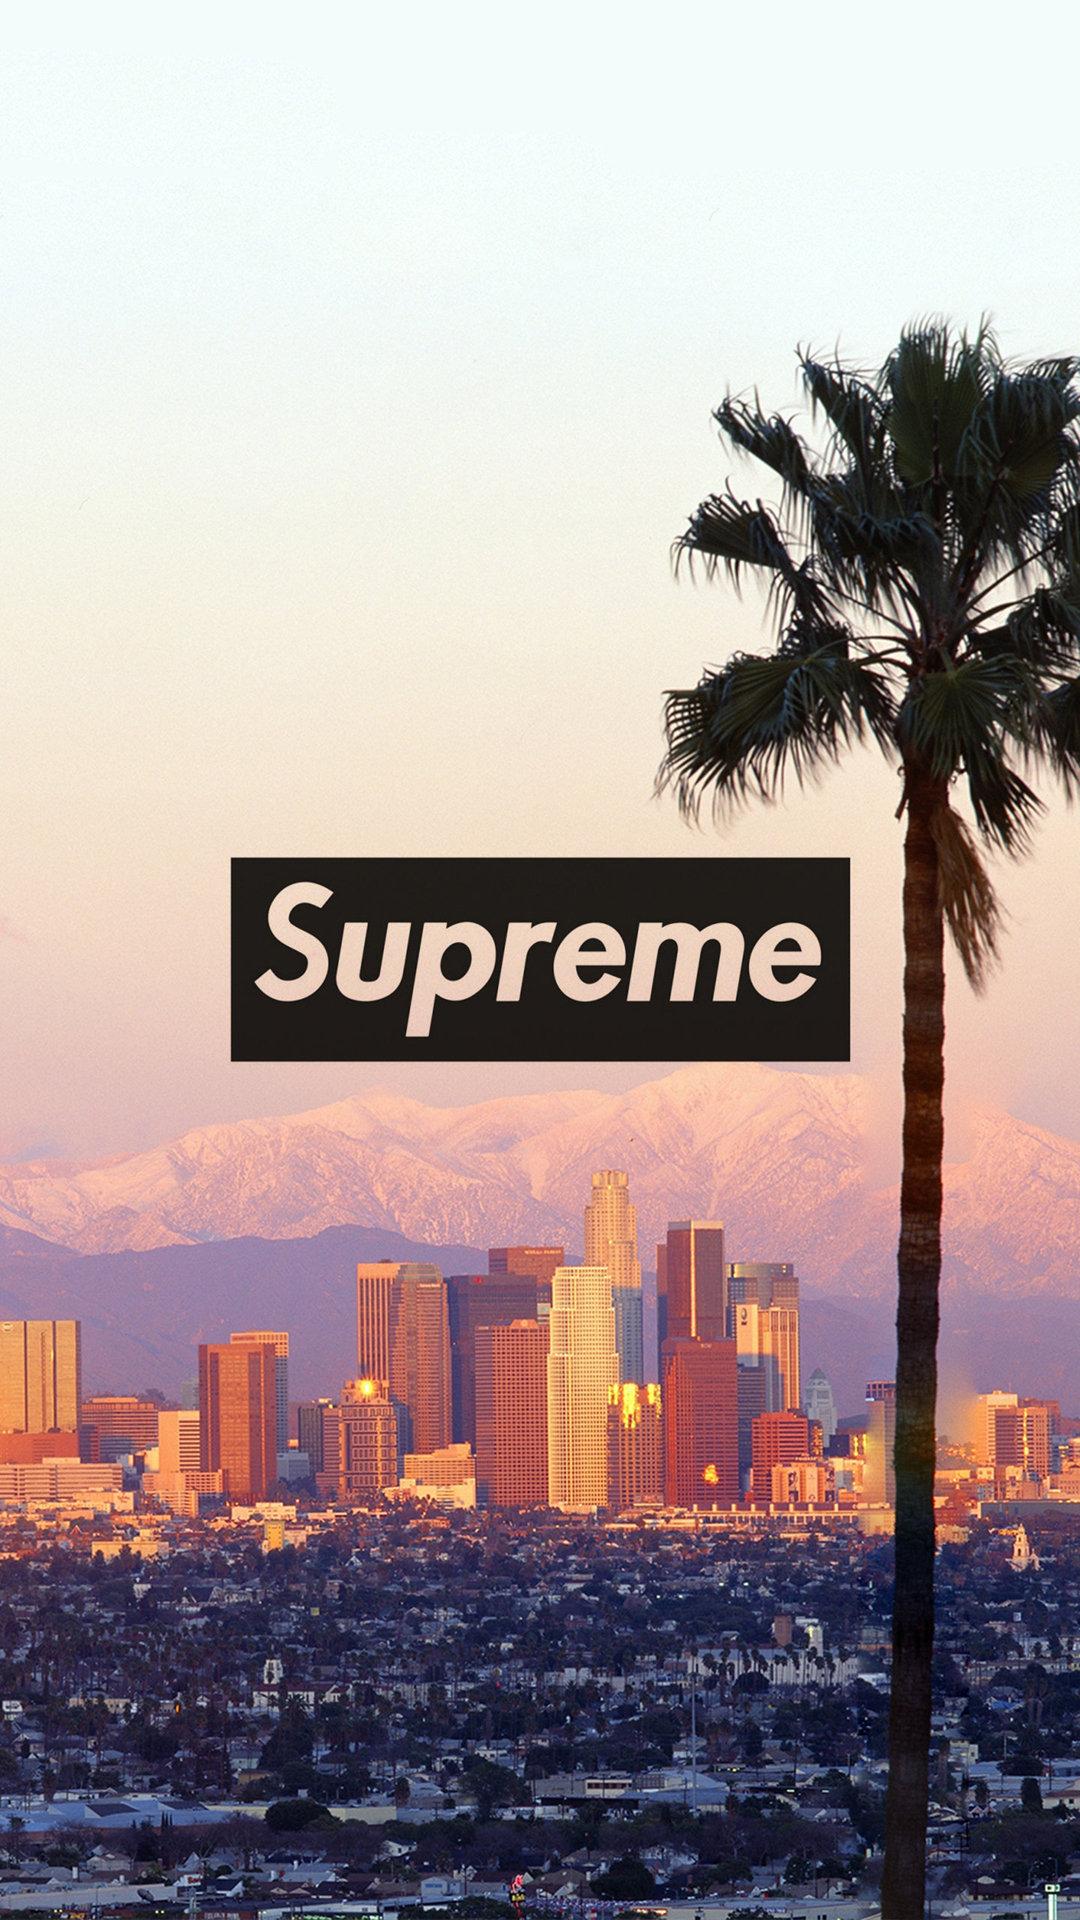 Supreme iPhone Wallpaper 1080x1920